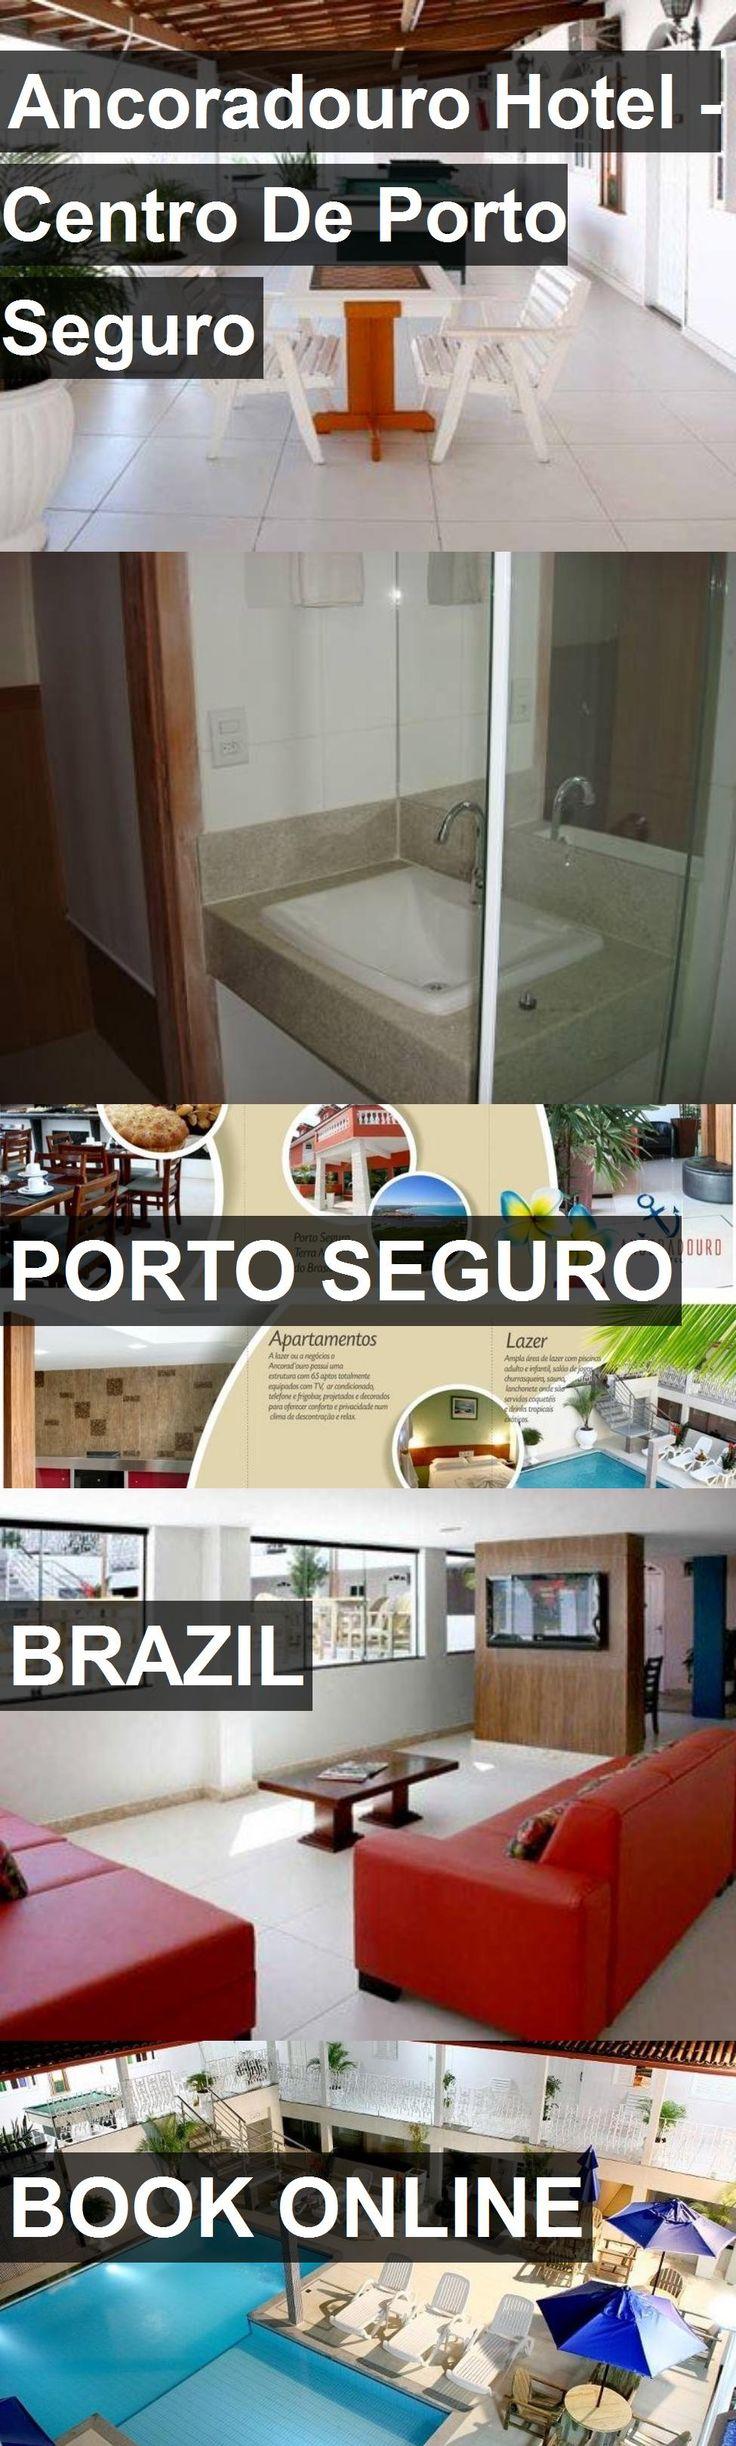 Hotel Ancoradouro Hotel - Centro De Porto Seguro in Porto Seguro, Brazil. For more information, photos, reviews and best prices please follow the link. #Brazil #PortoSeguro #AncoradouroHotel-CentroDePortoSeguro #hotel #travel #vacation